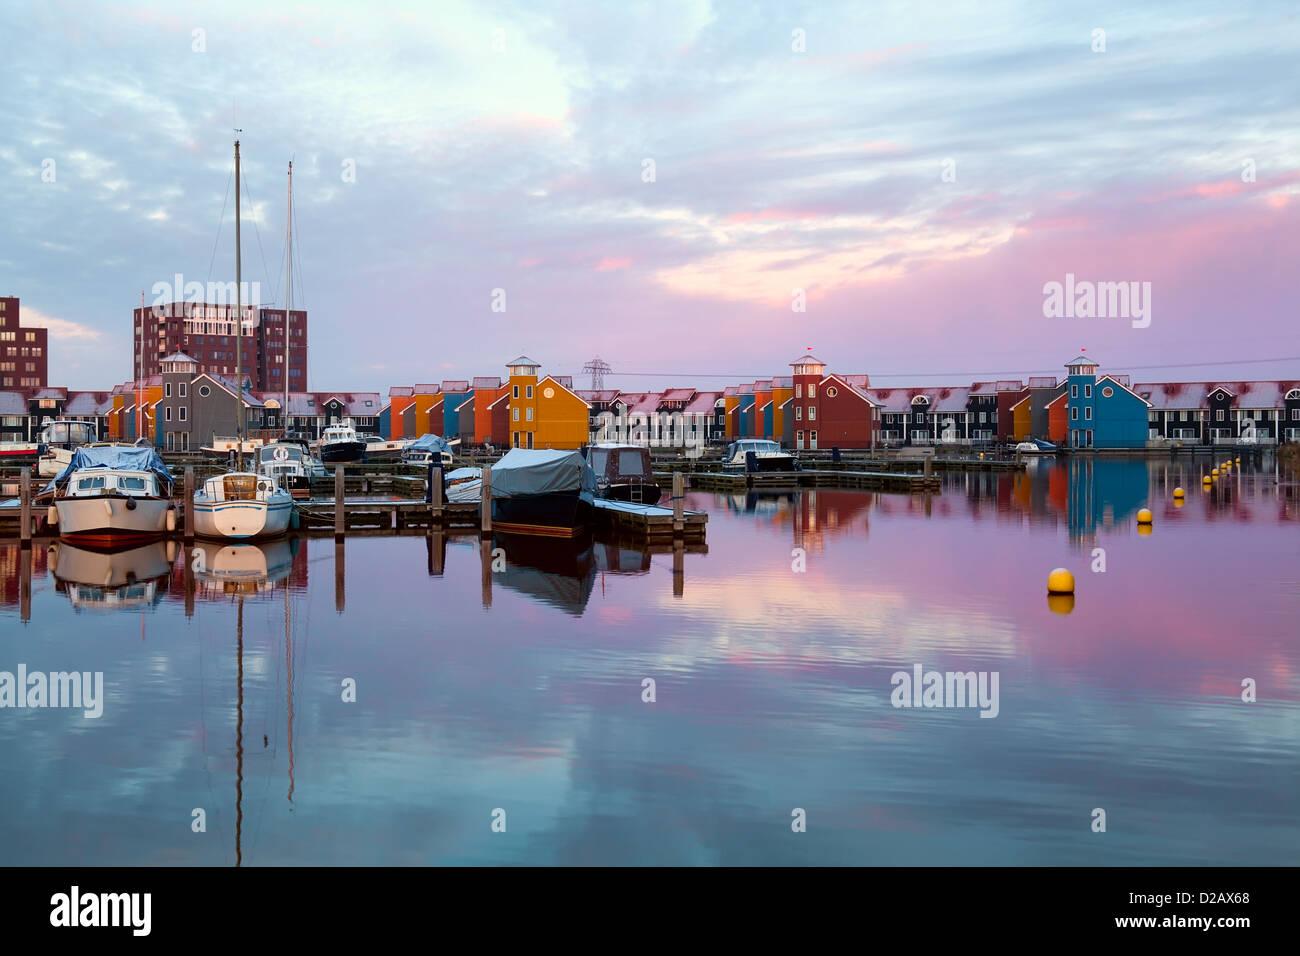 Espectacular amanecer sobre Reitdiephaven marina en Groninga. Foto de stock